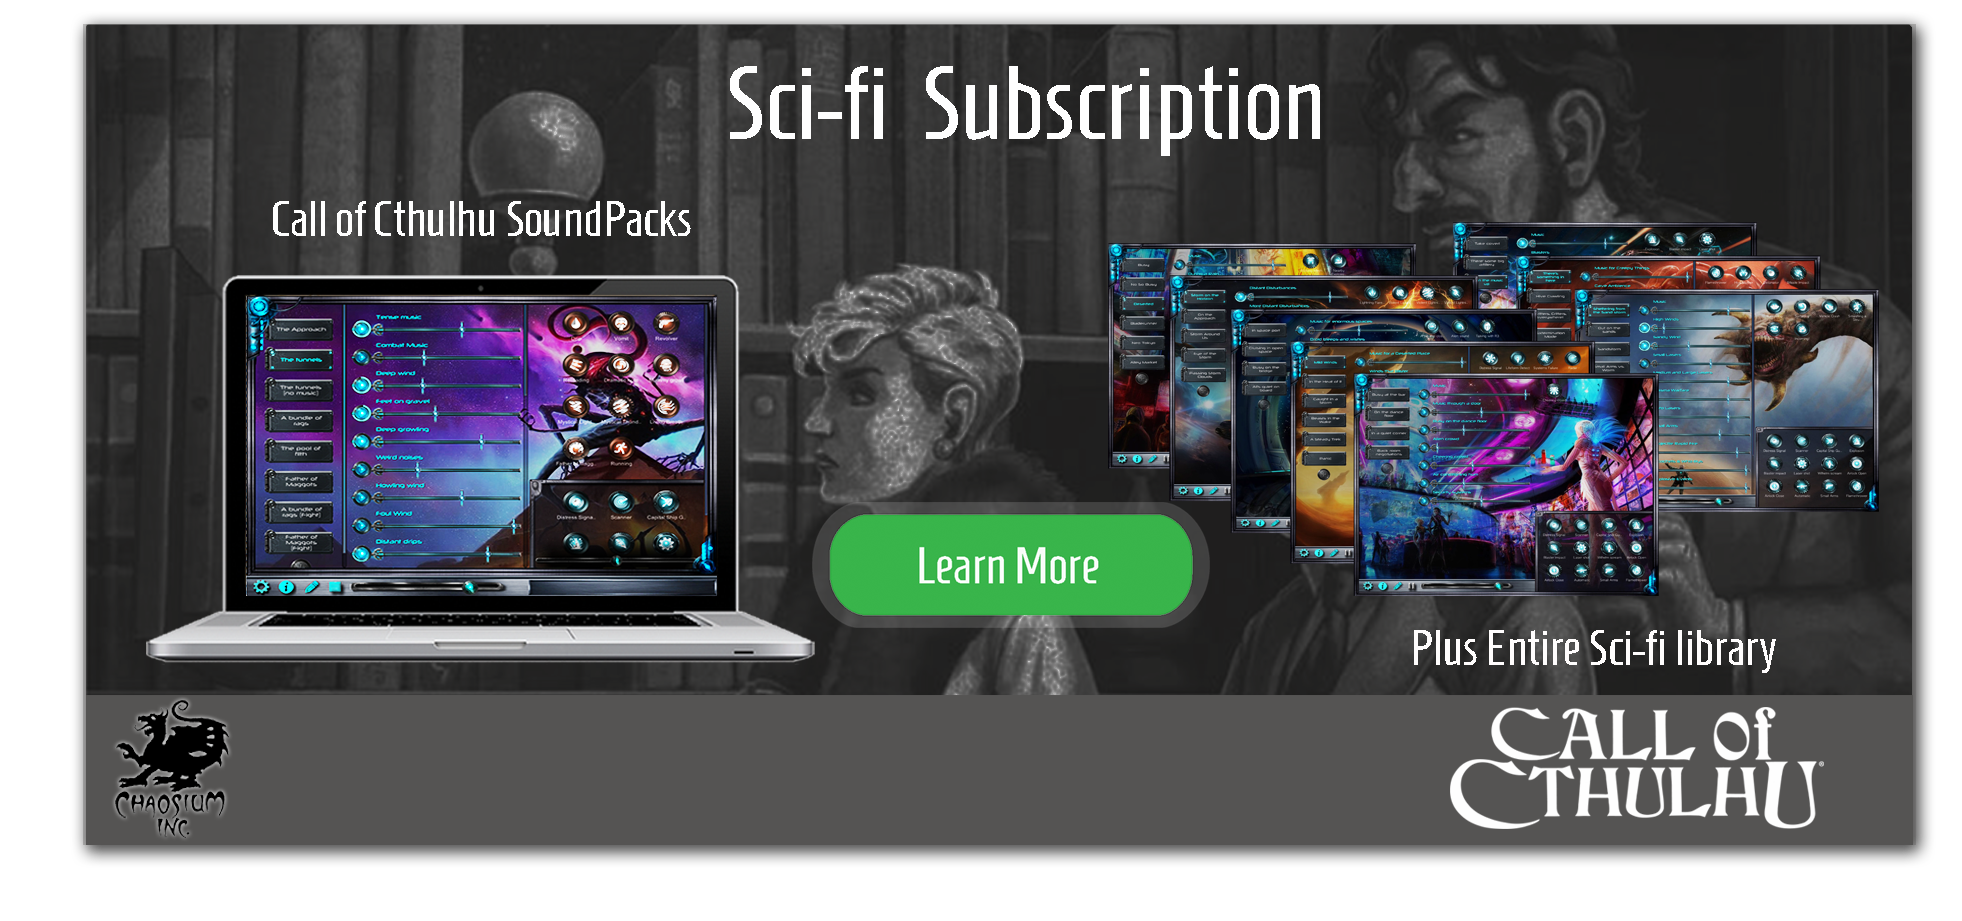 Get a Sci-fi subscription